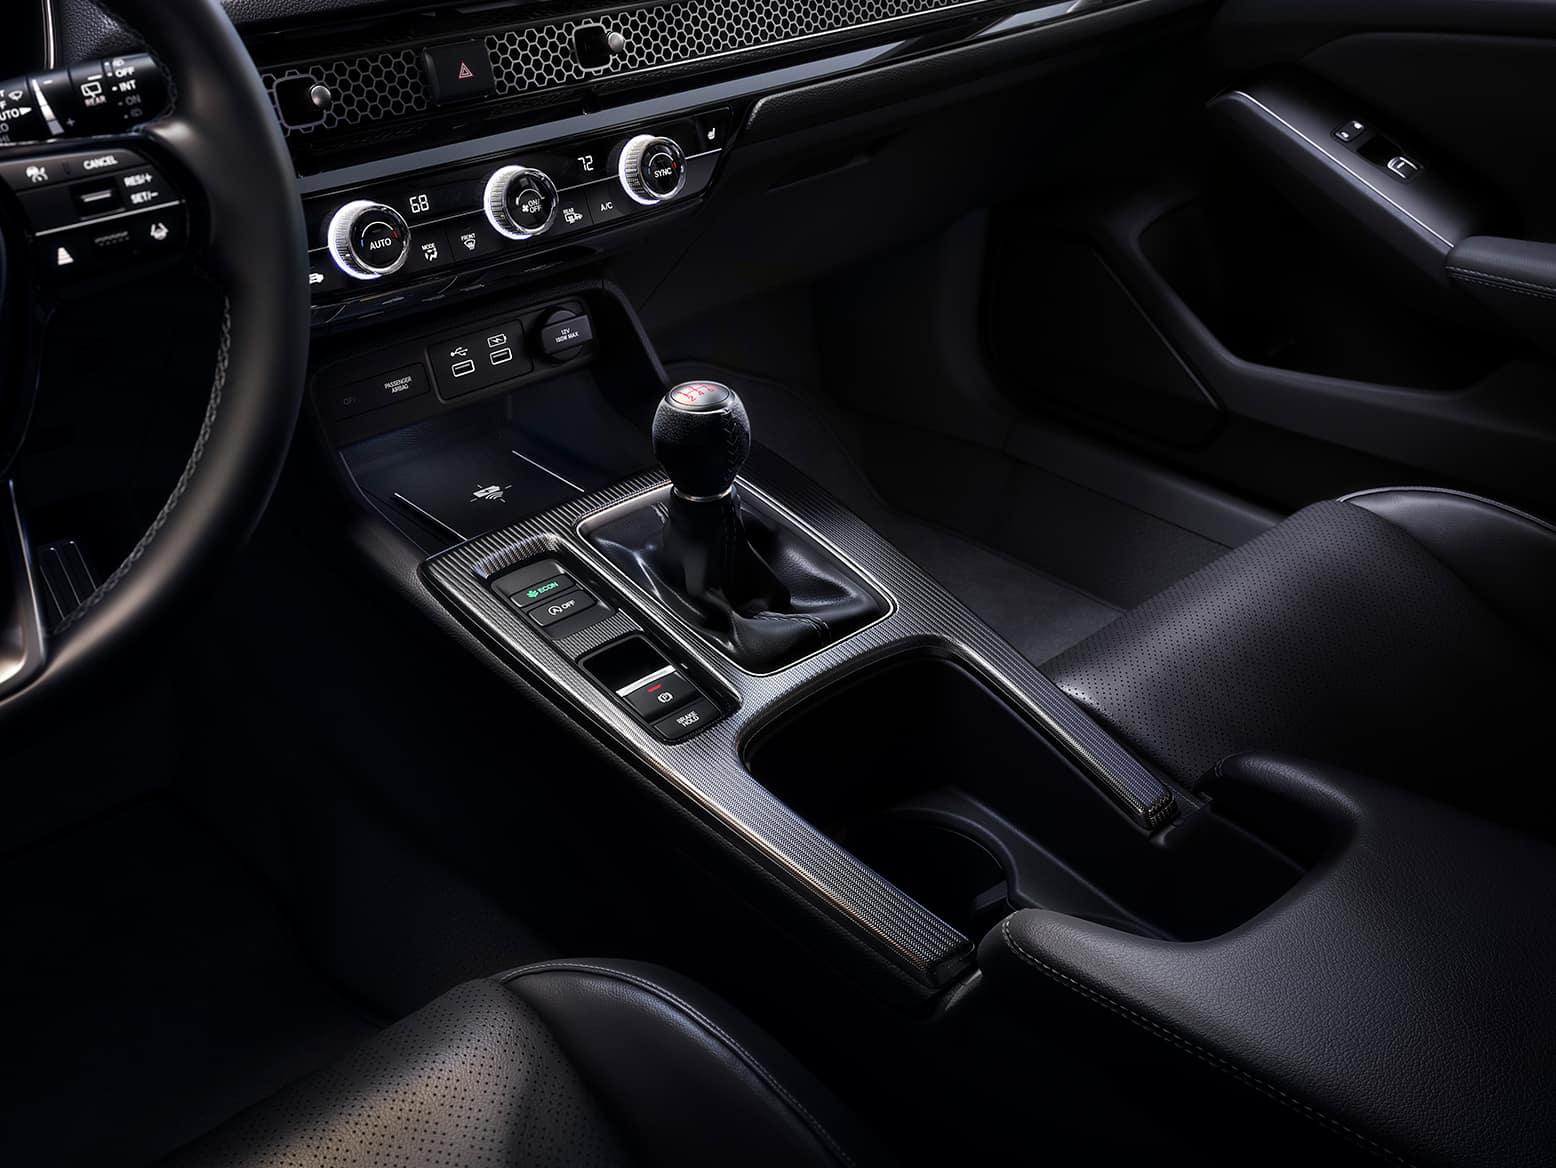 2022 Honda Civic Hatchback Sport Trim Features